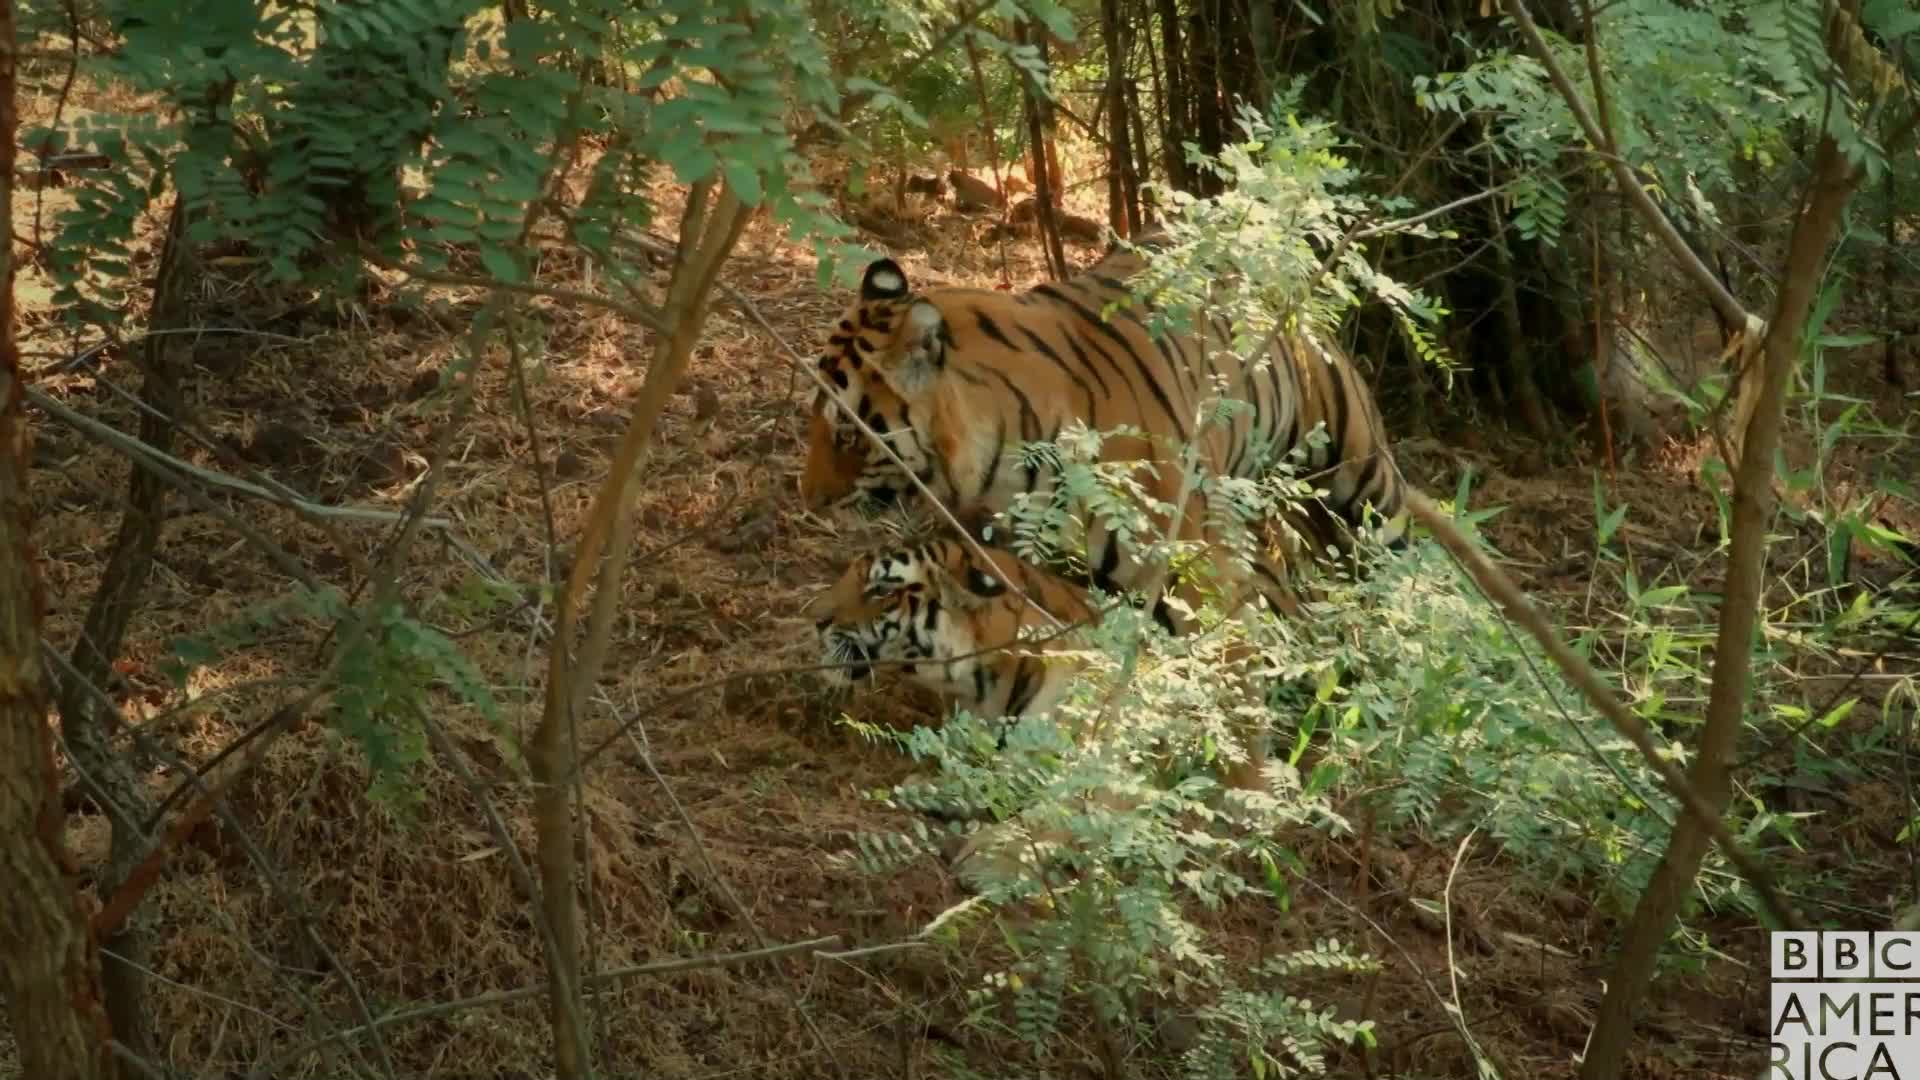 animal, animals, bbc america, bbc america dynasties, bbc america: dynasties, dynasties, love, mating, sex, tiger, tigers, Dynasties Tigers Mating GIFs